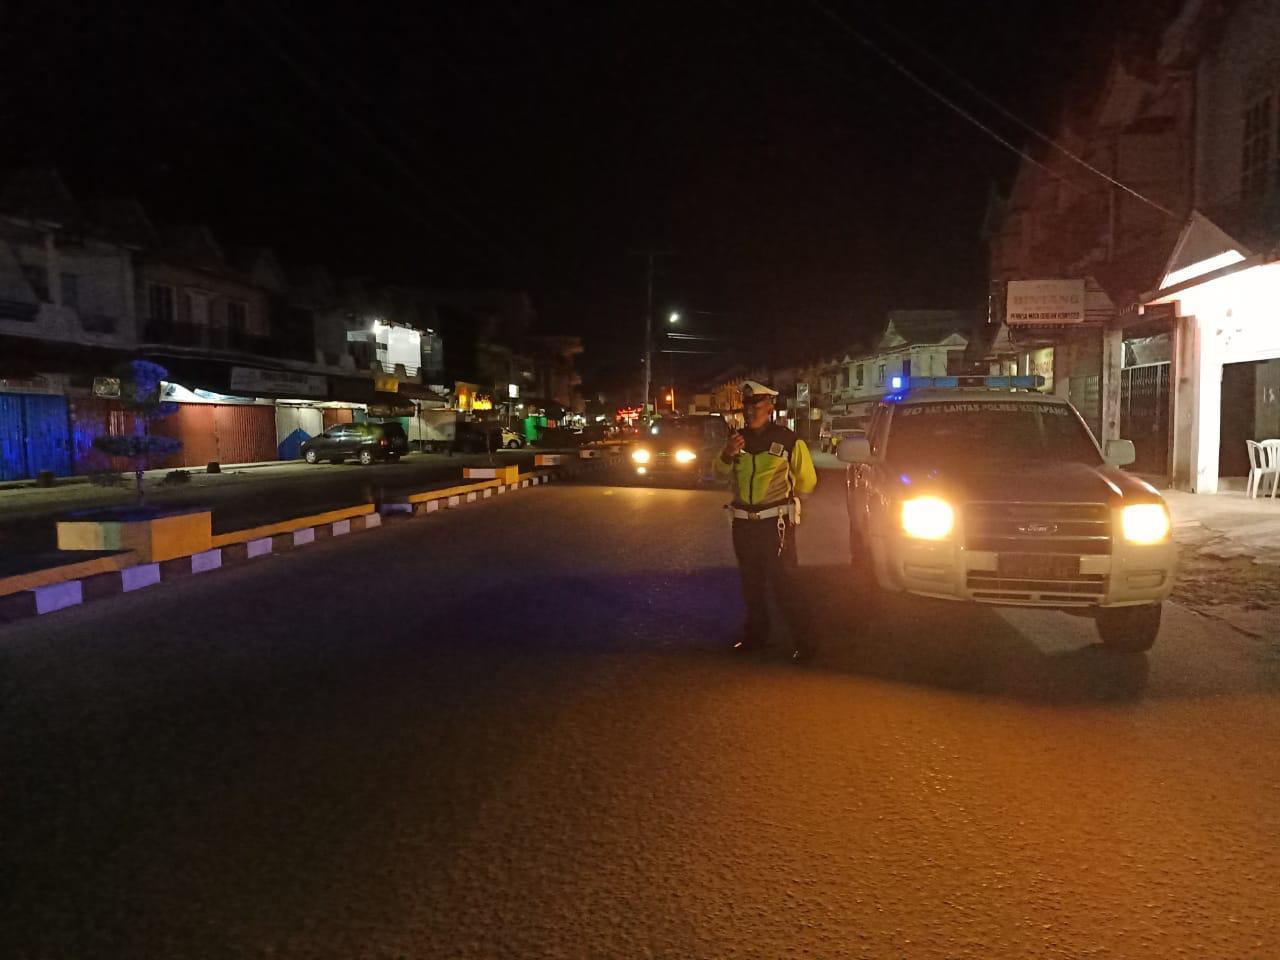 Memastikan Keamanan Wilayah, Sat Lantas Polres Ketapang Laksanakan Giat Patroli Malam Hari